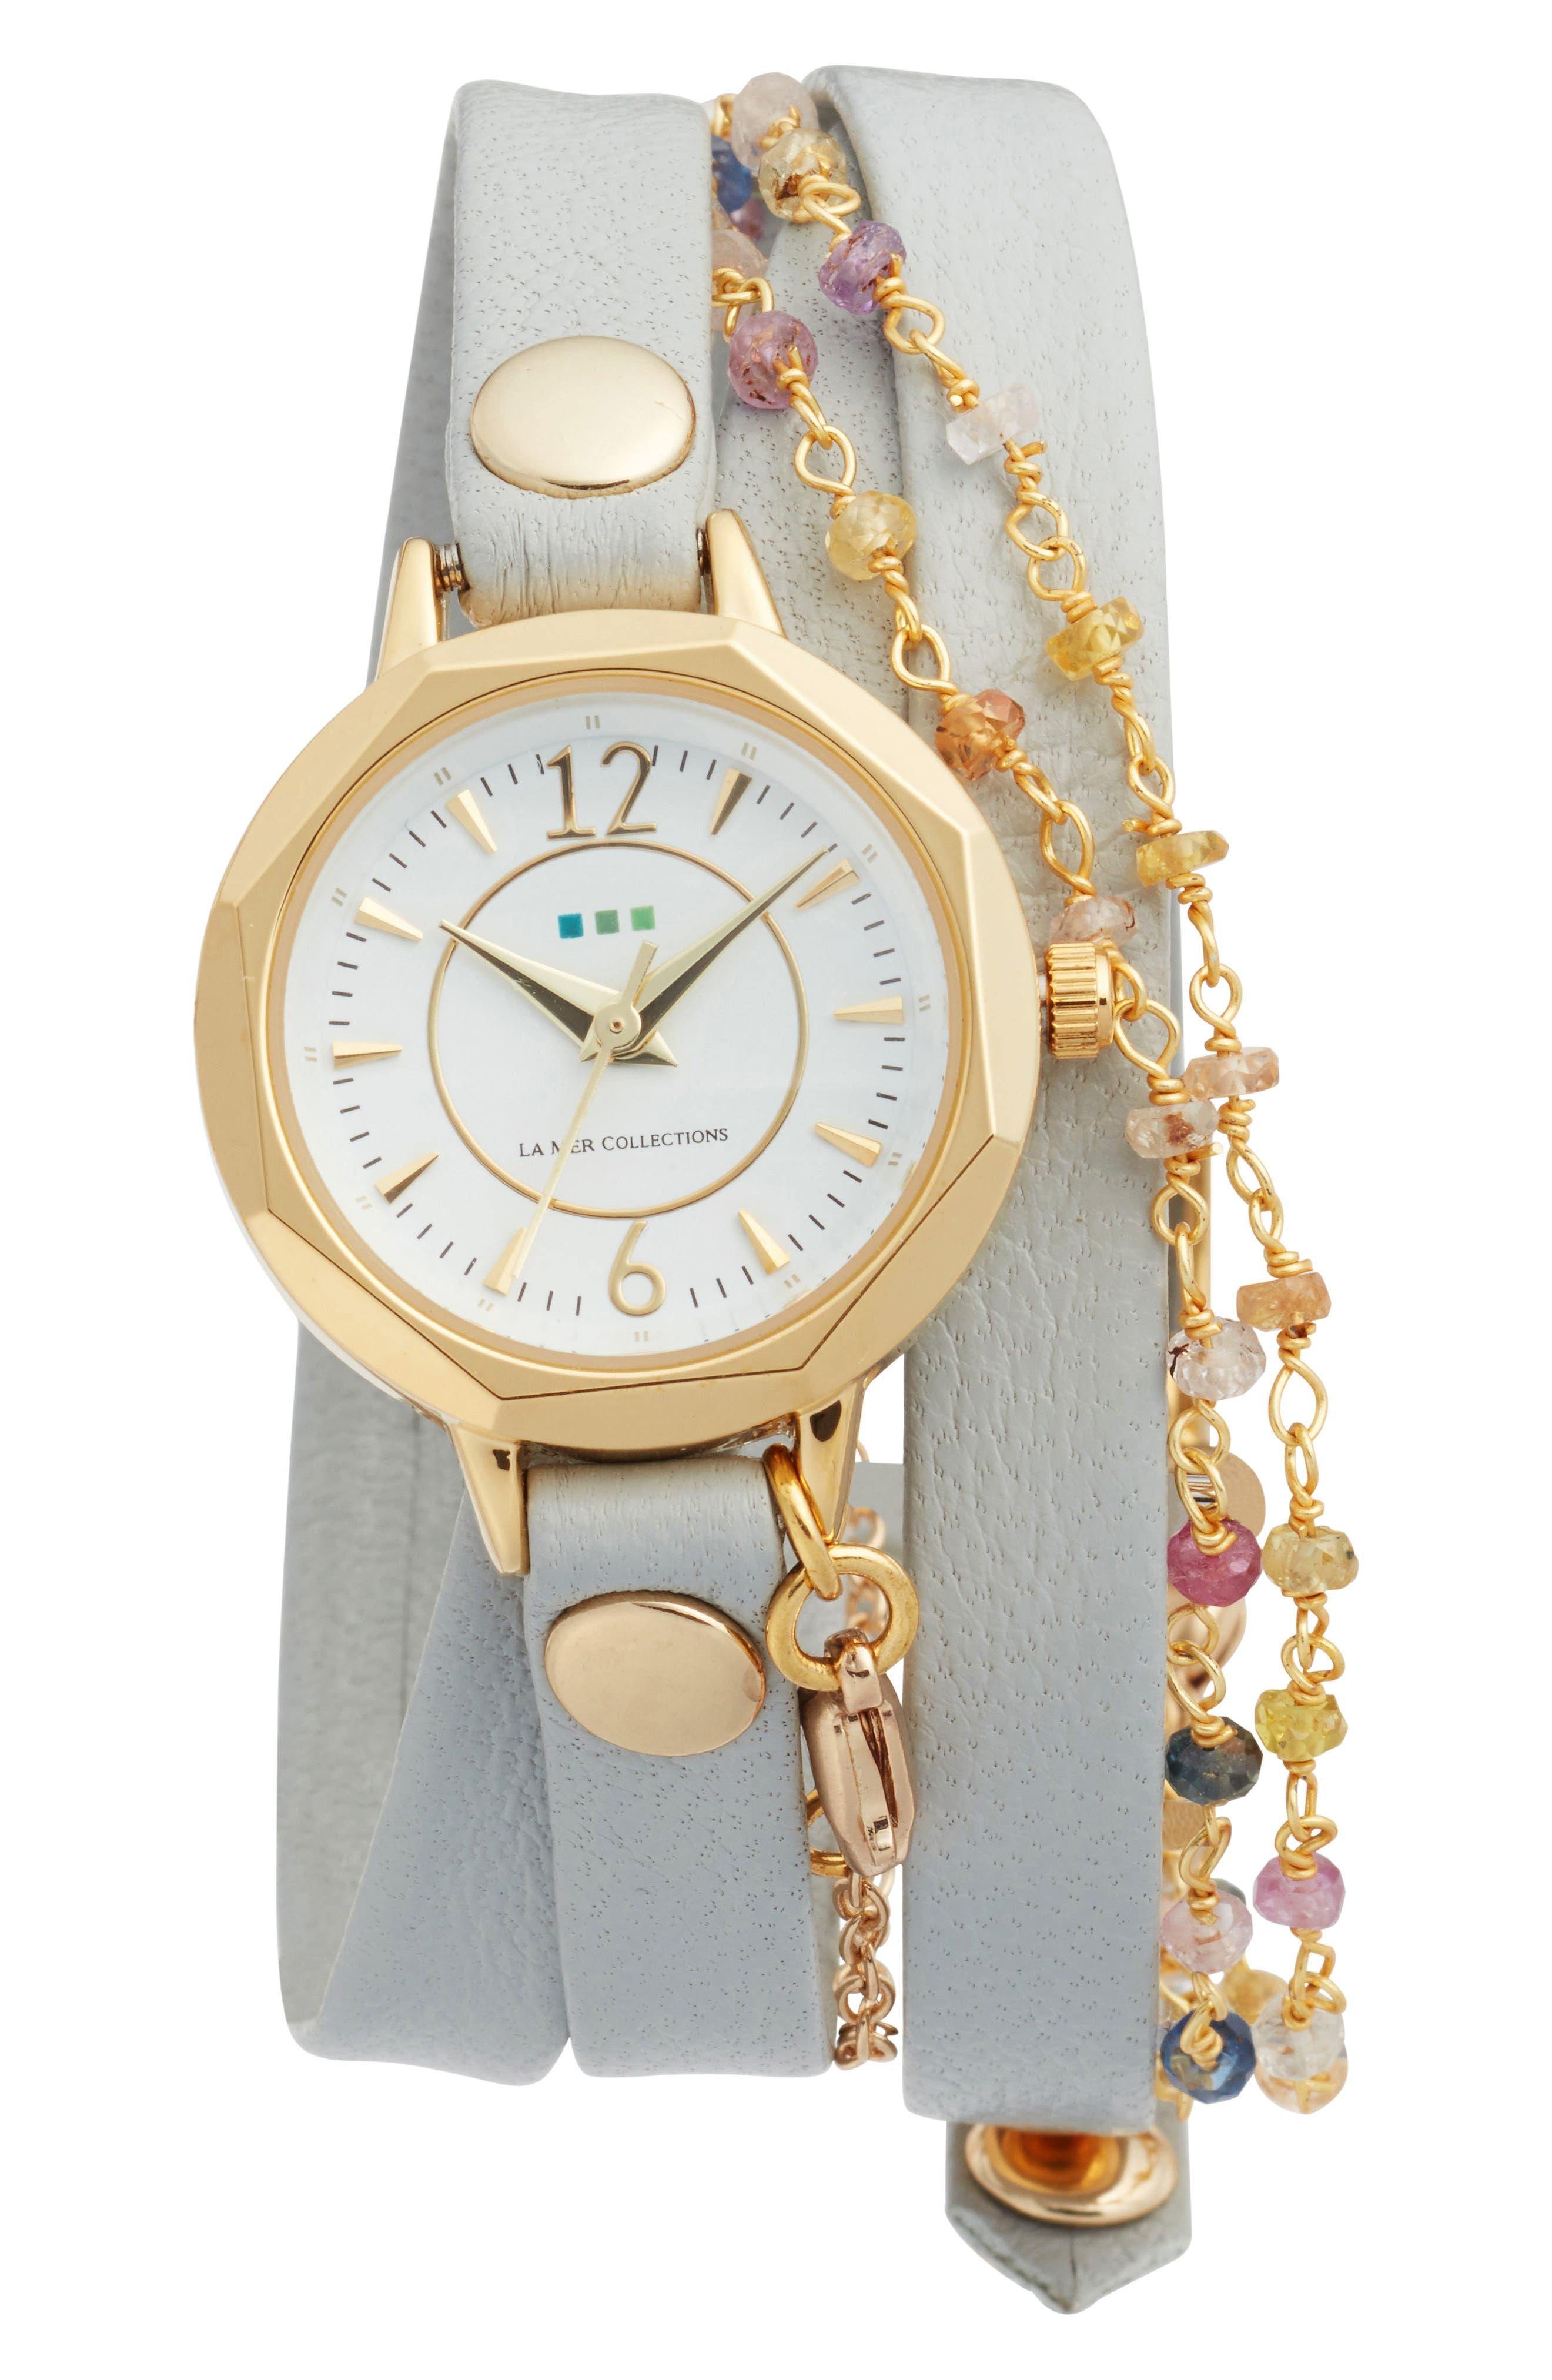 La Mer Nolita Leather Wrap Strap Watch, 22mm,                             Main thumbnail 1, color,                             STONE/WHITE/GOLD